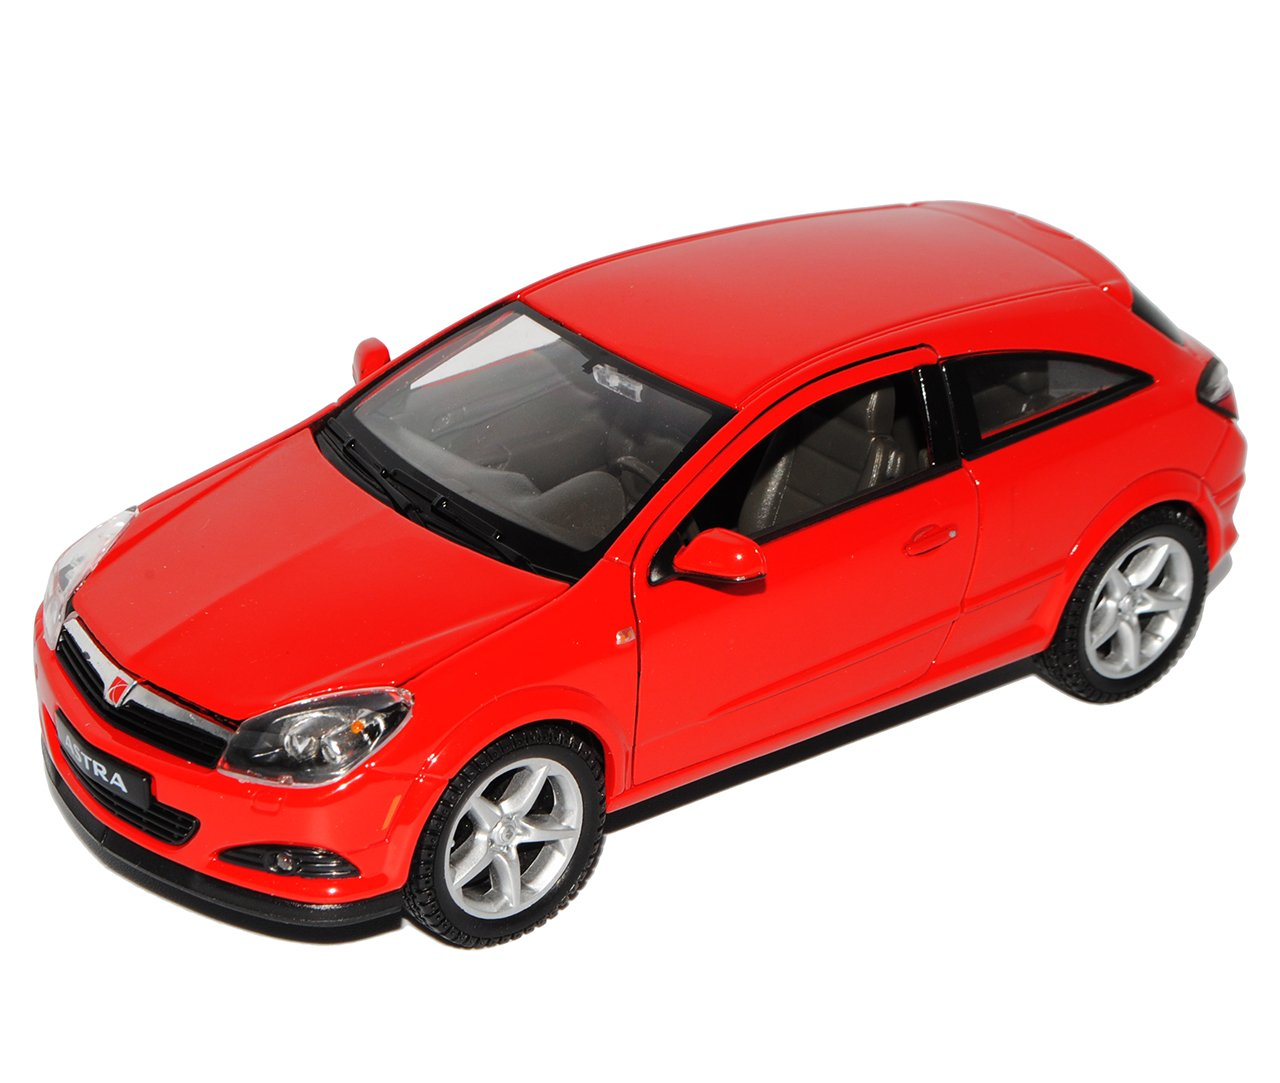 Welly Opel Astra H GTC Rot Coupe 2005-2010 1/24 Modell Auto mit individiuellem Wunschkennzeichen Modellcarsonline